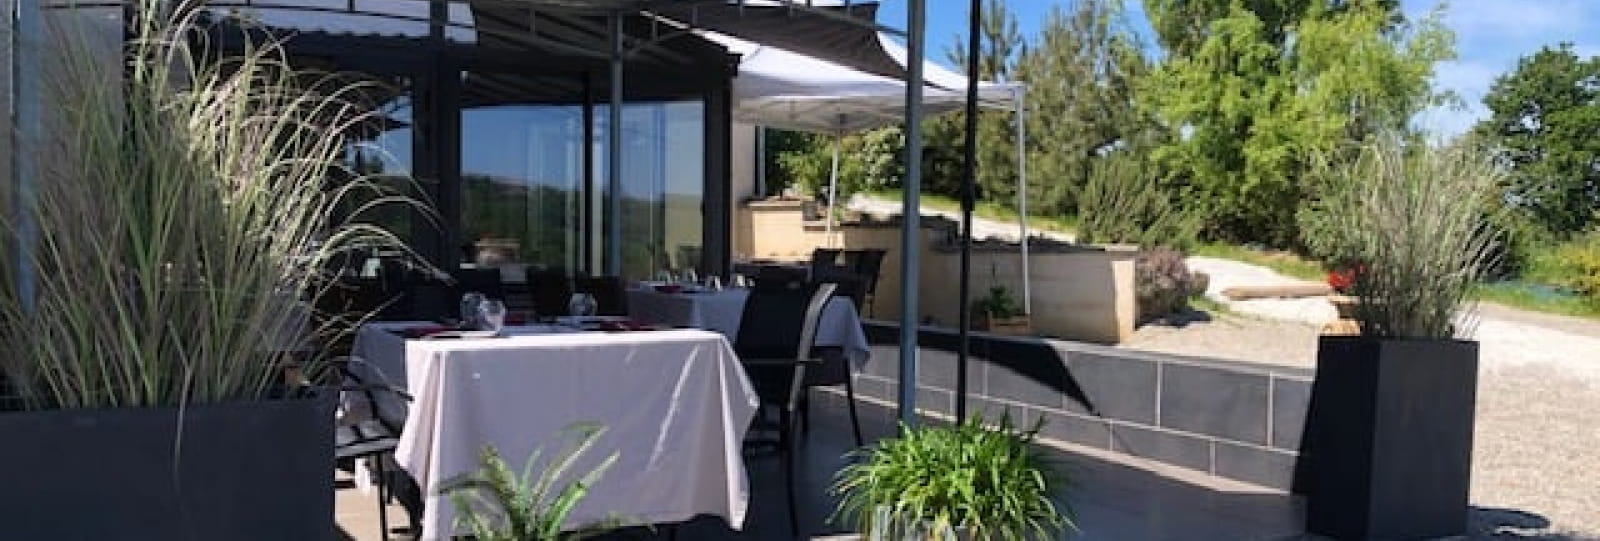 Terrasse restaurant Spa Oasis